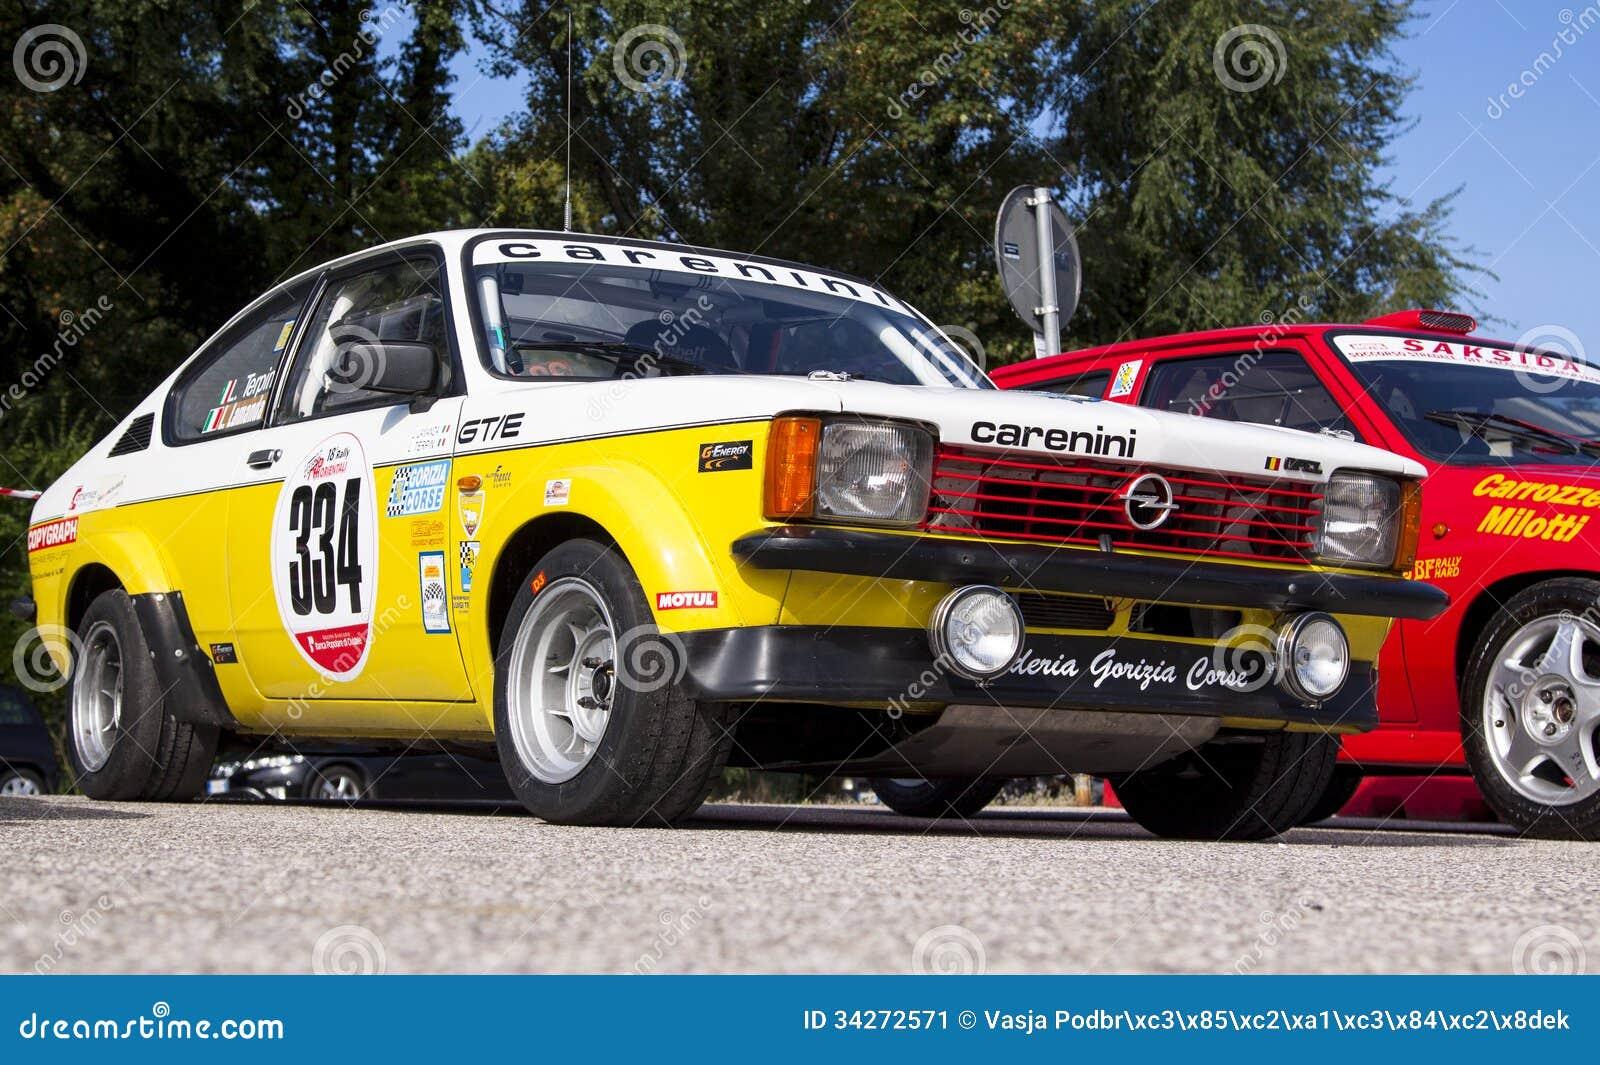 368 Opel Kadett Photos Free Royalty Free Stock Photos From Dreamstime